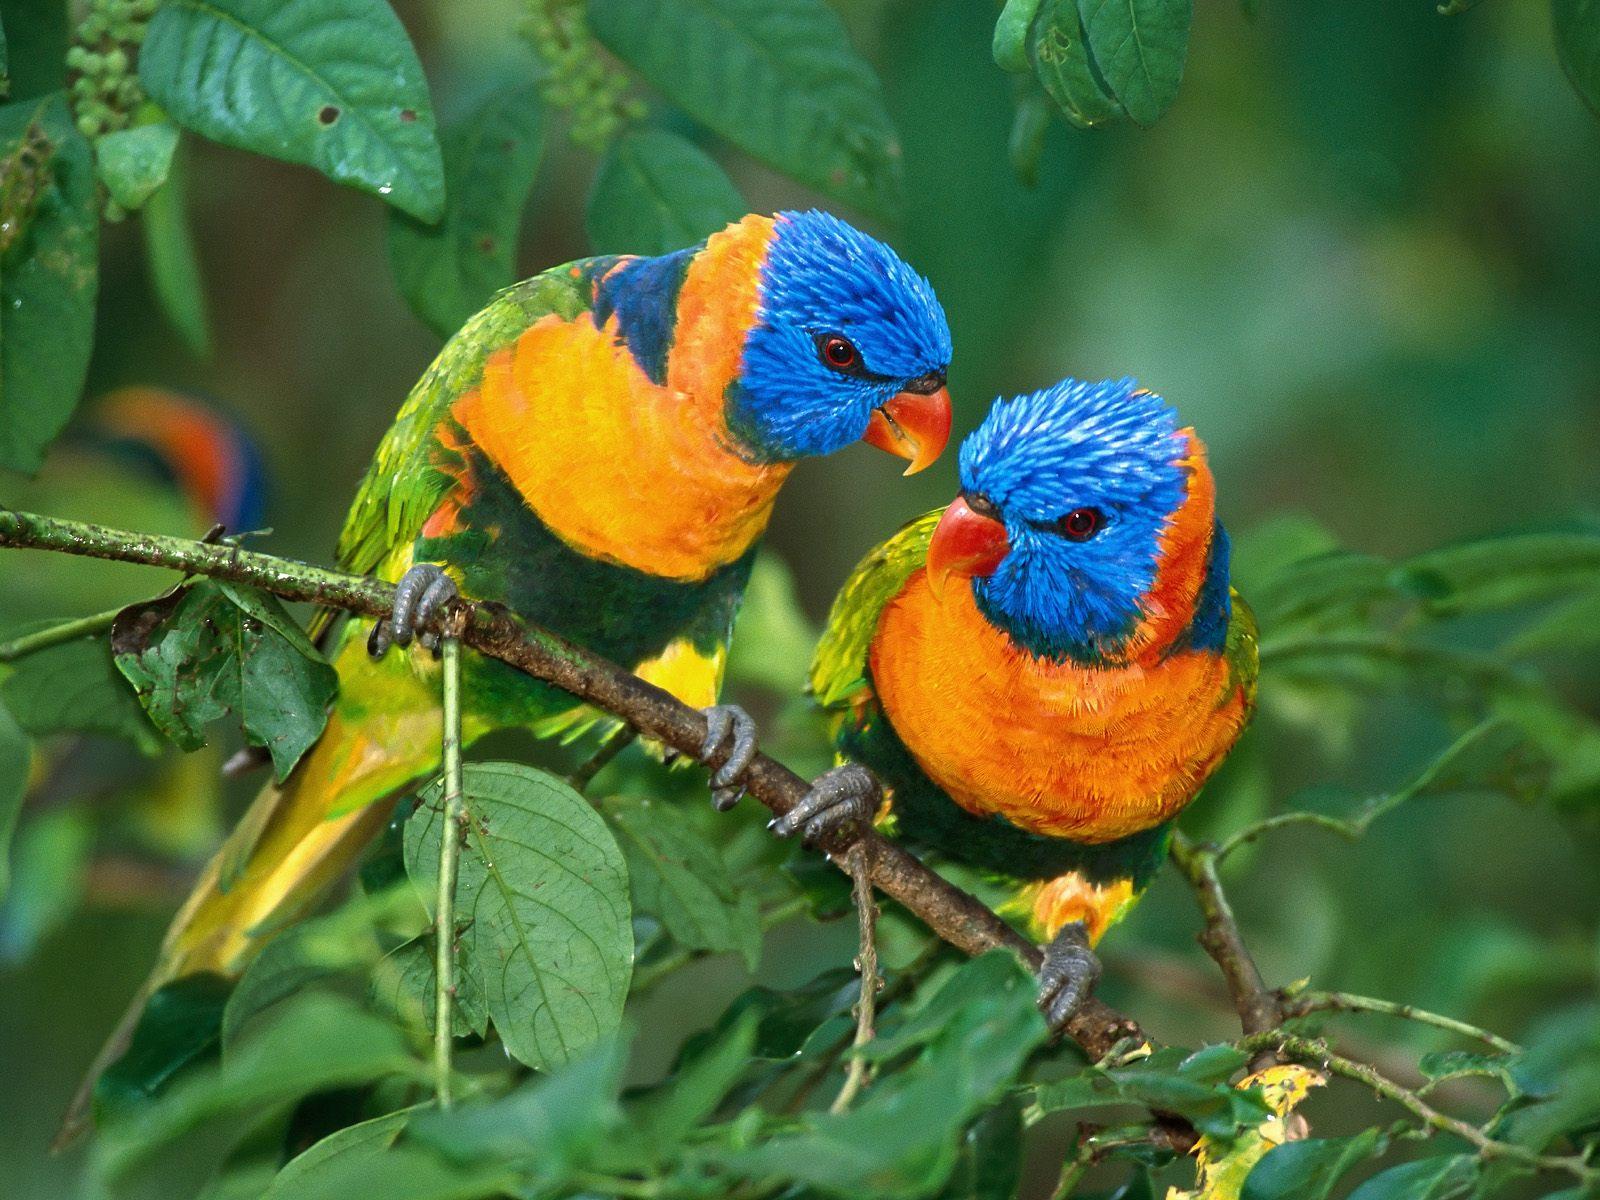 Wallpaper Gallery: Love Bird Wallpaper - 1